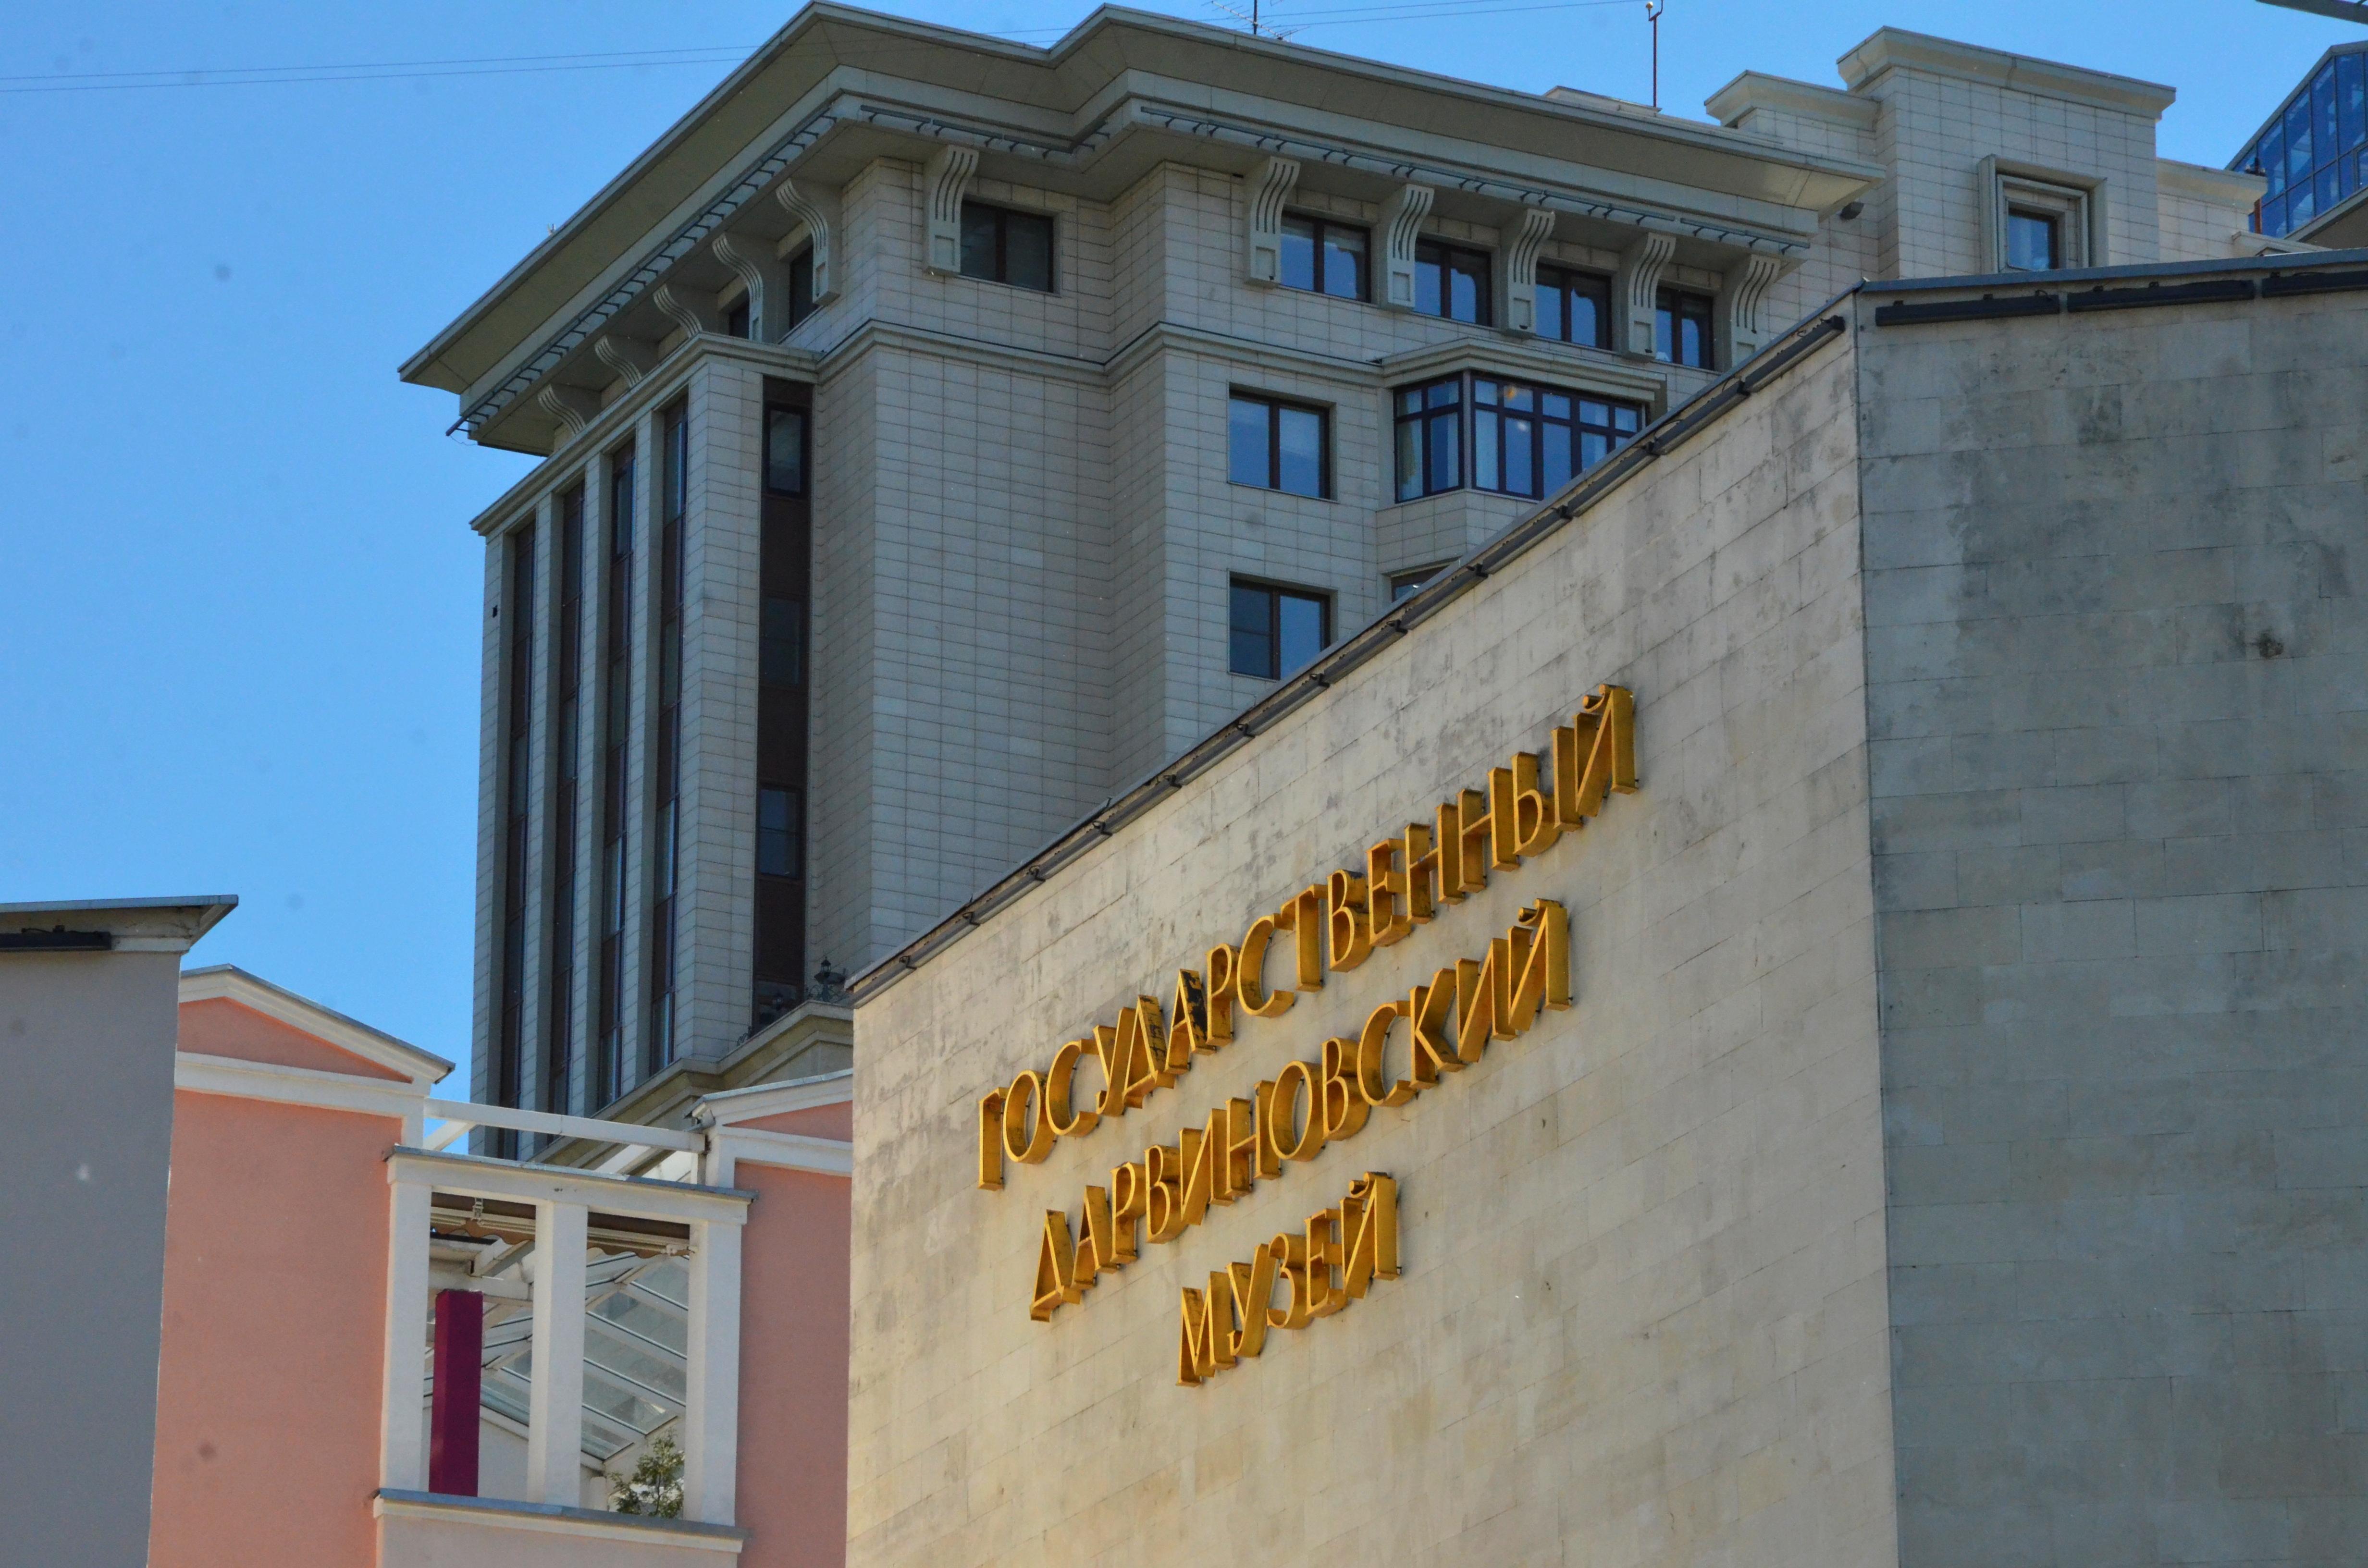 Дюймовочка Андерсена: москвичей пригласили на мастер-класс в Дарвиновский музей